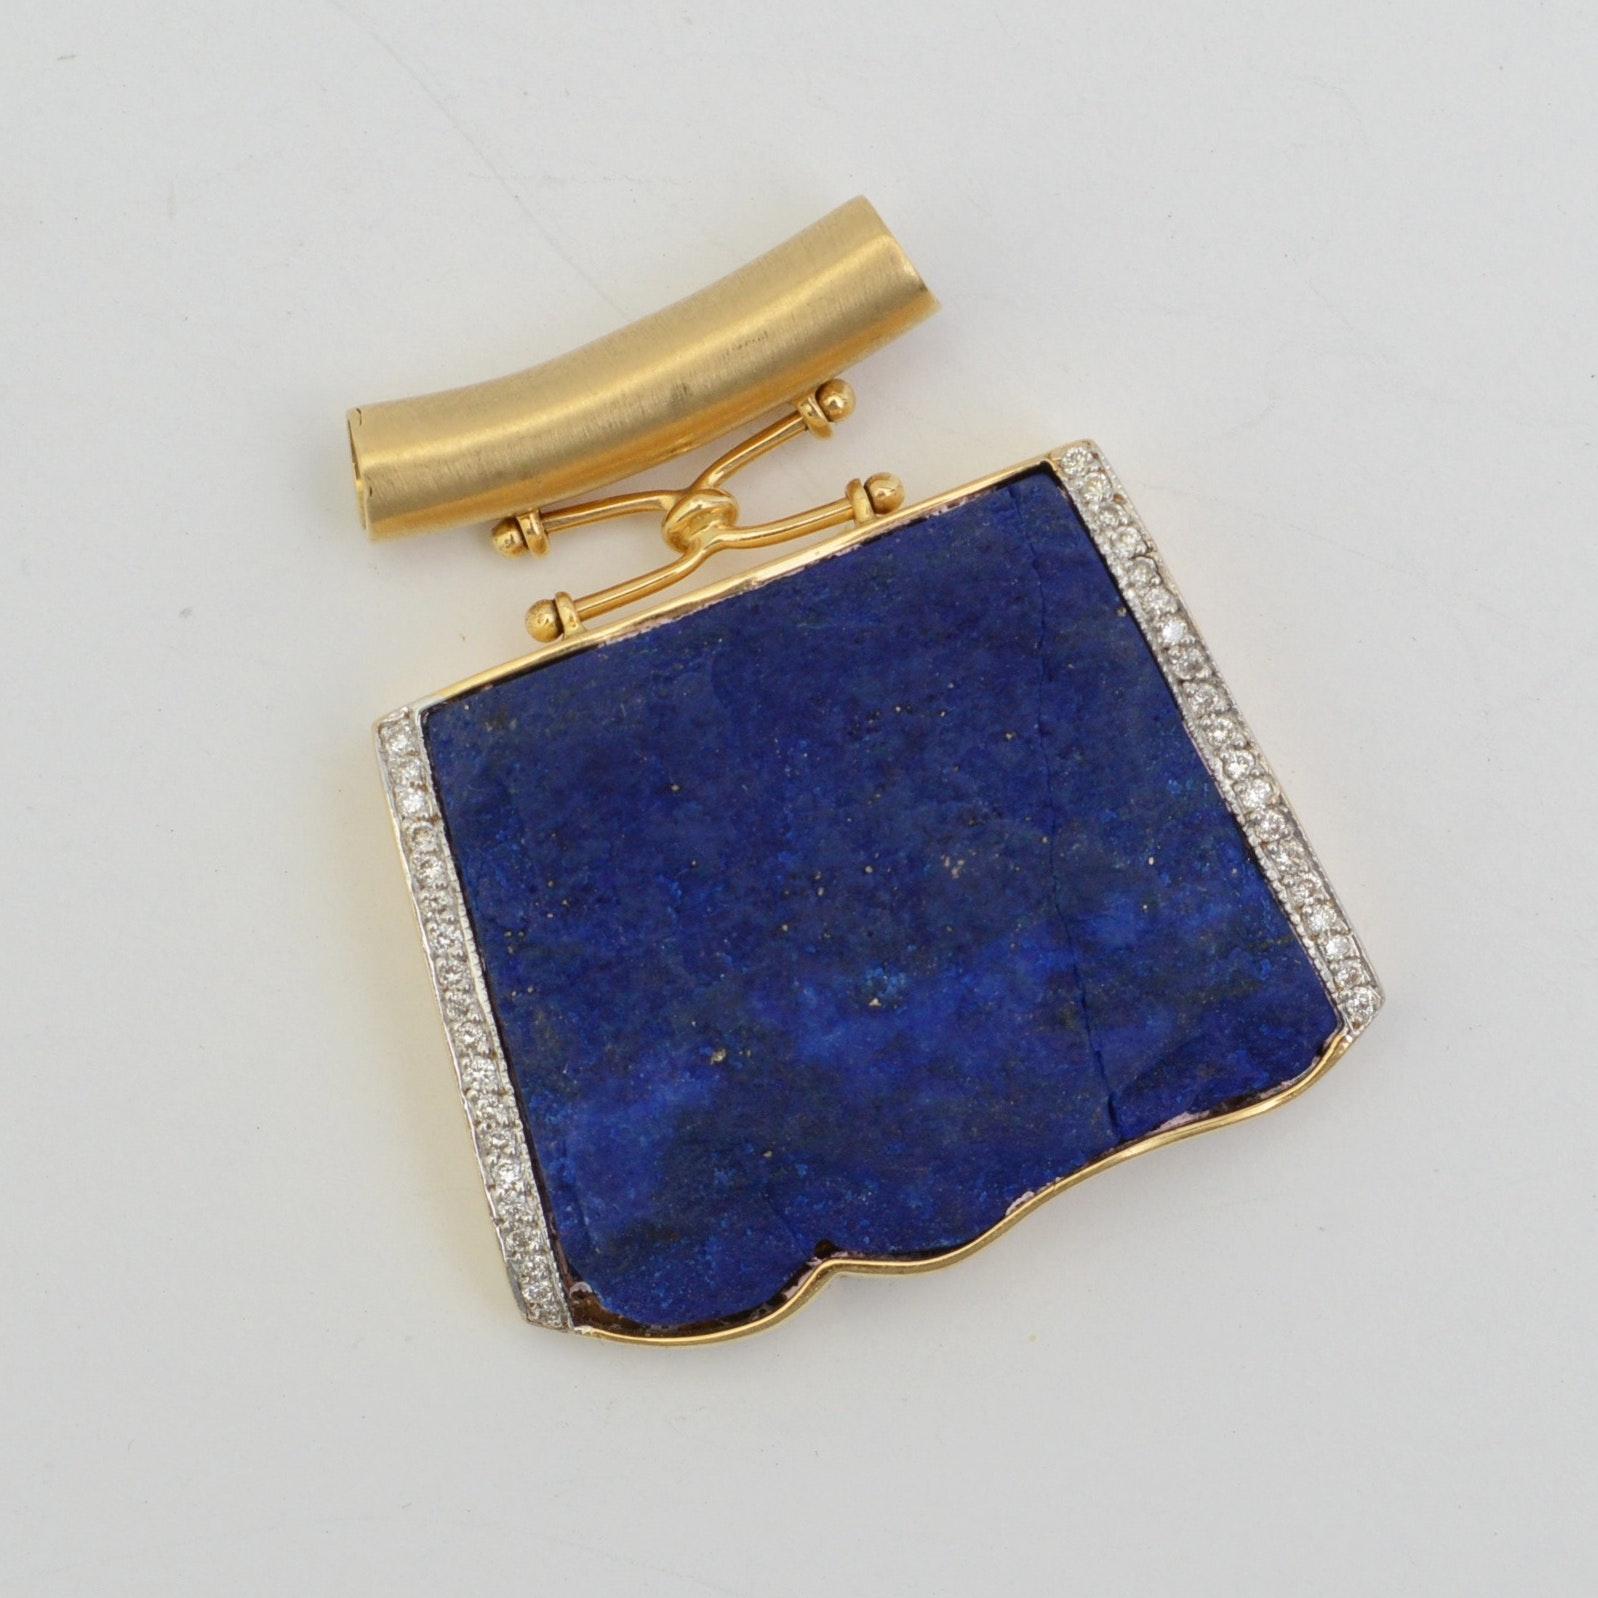 18K Yellow Gold Diamond and Lapis Pendant